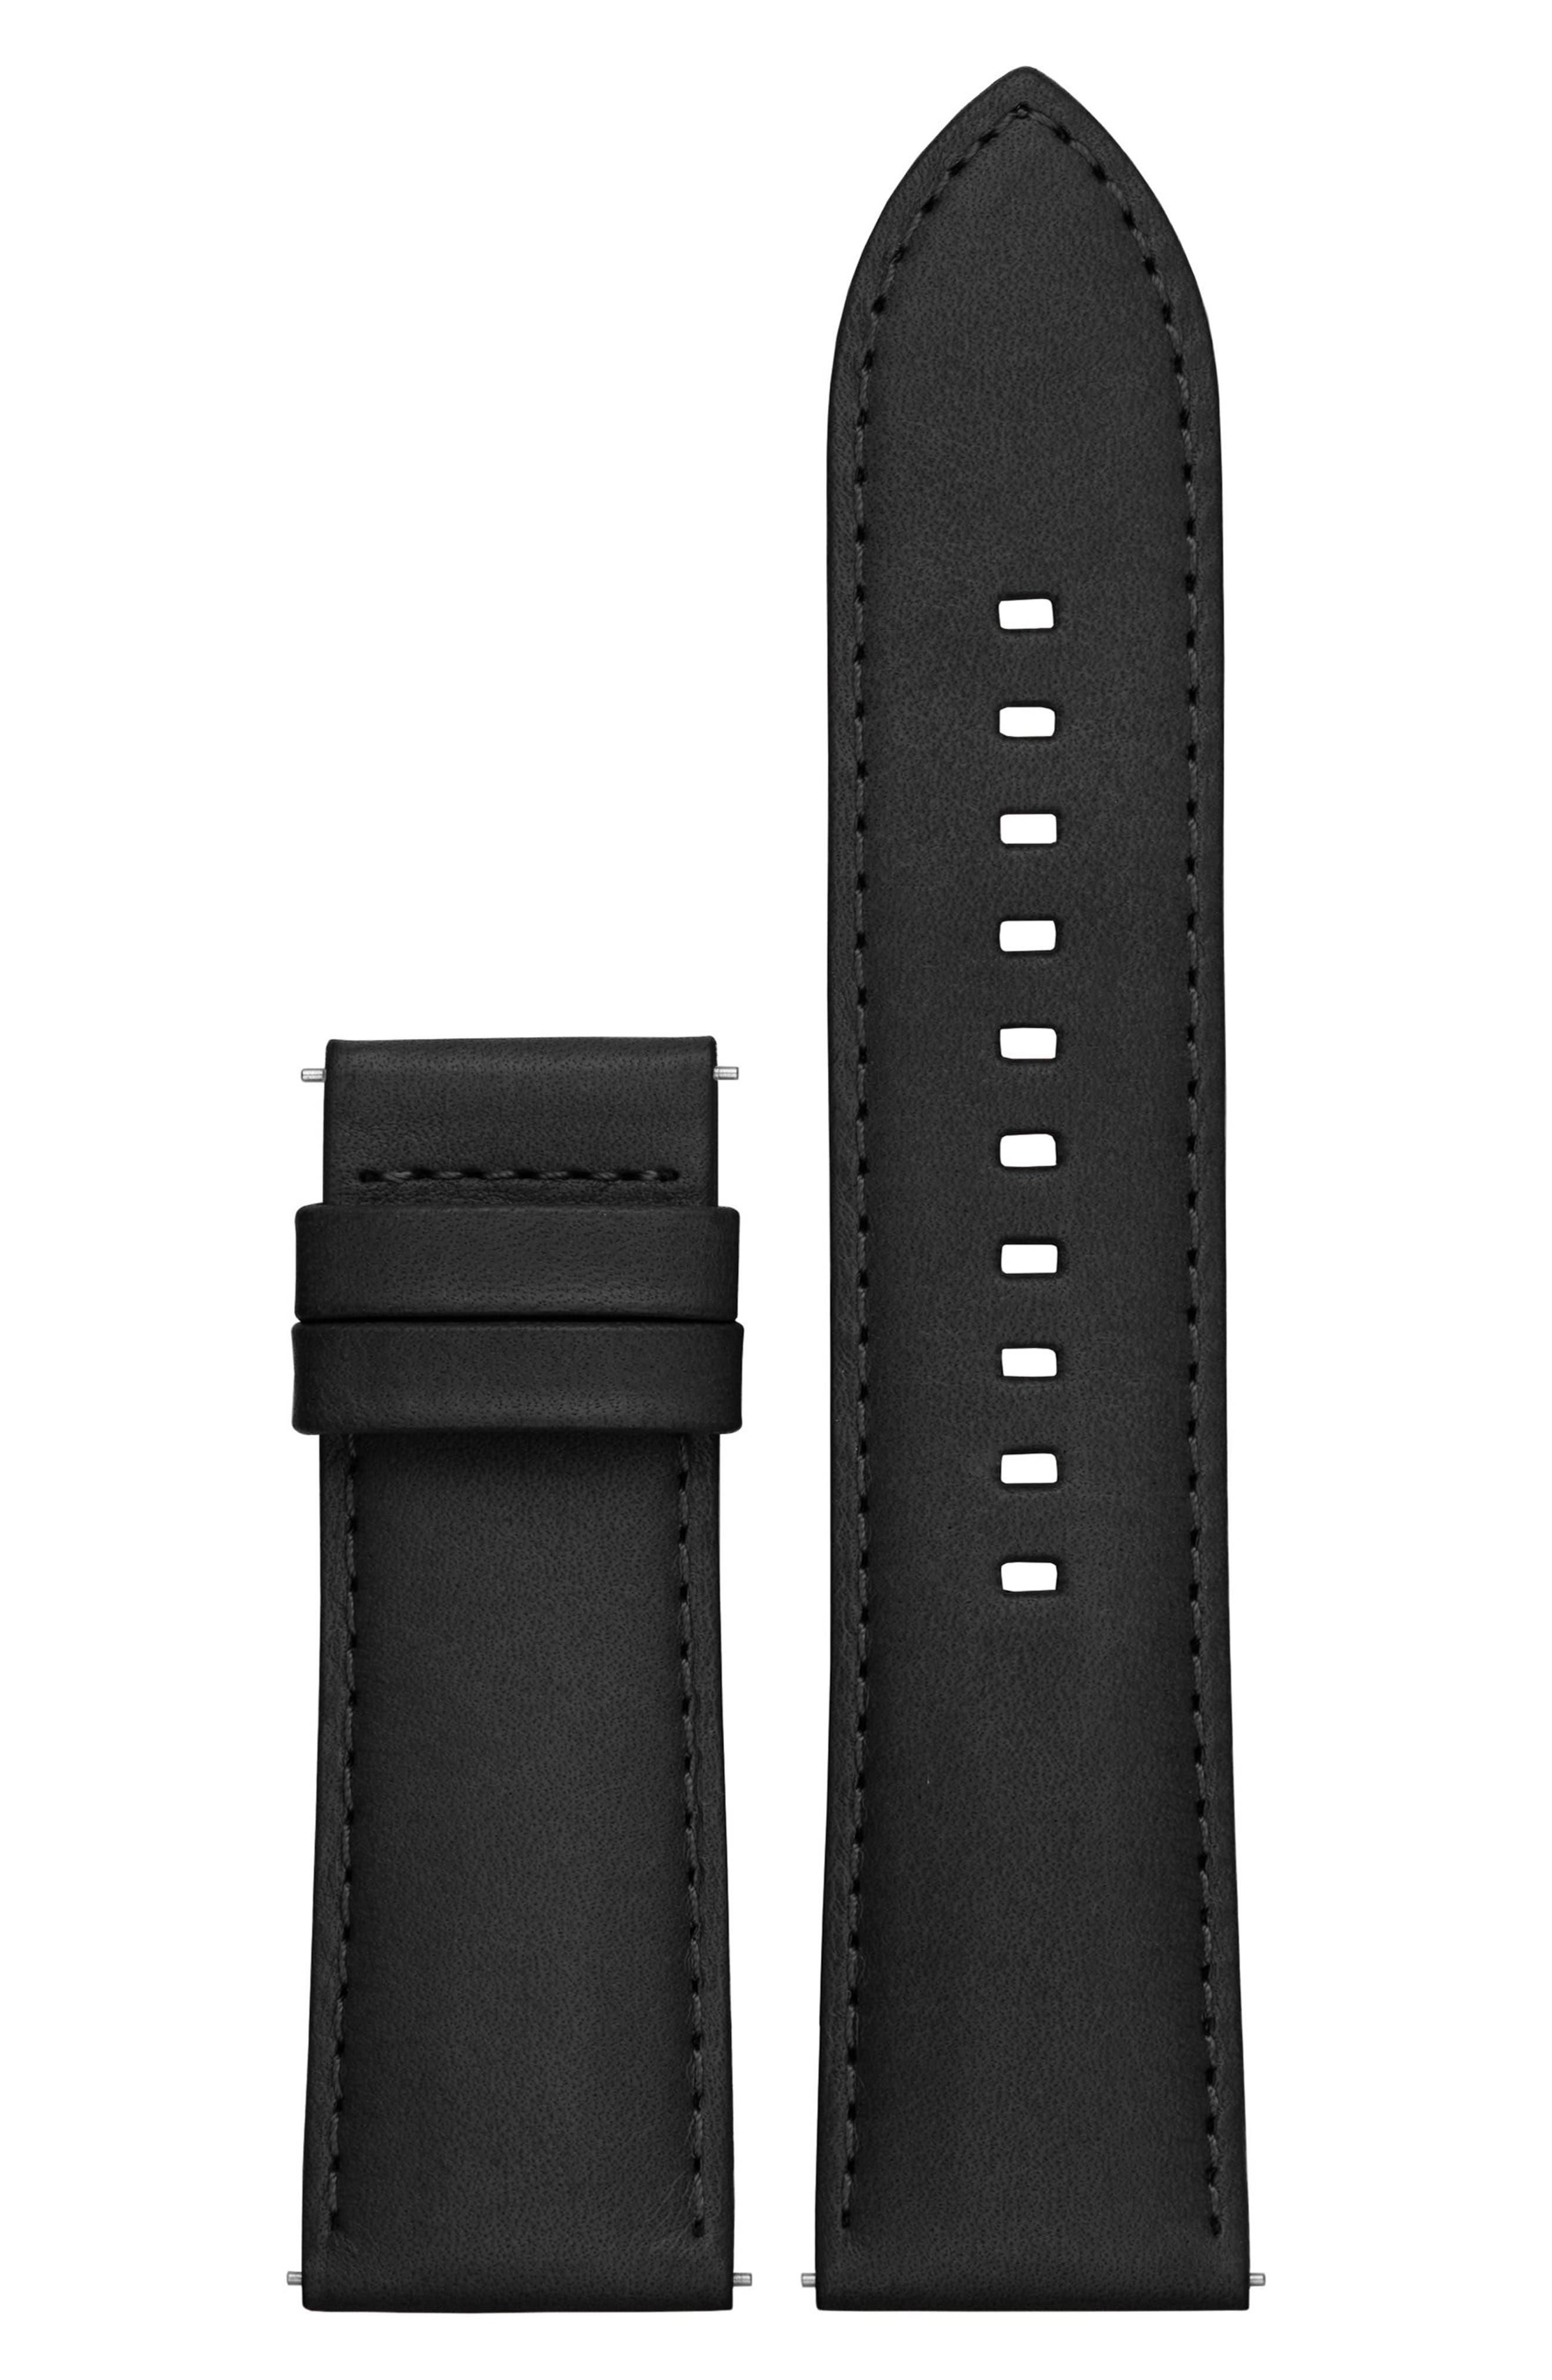 Main Image - Michael Kors Access Grayson 24mm Leather Watch Strap